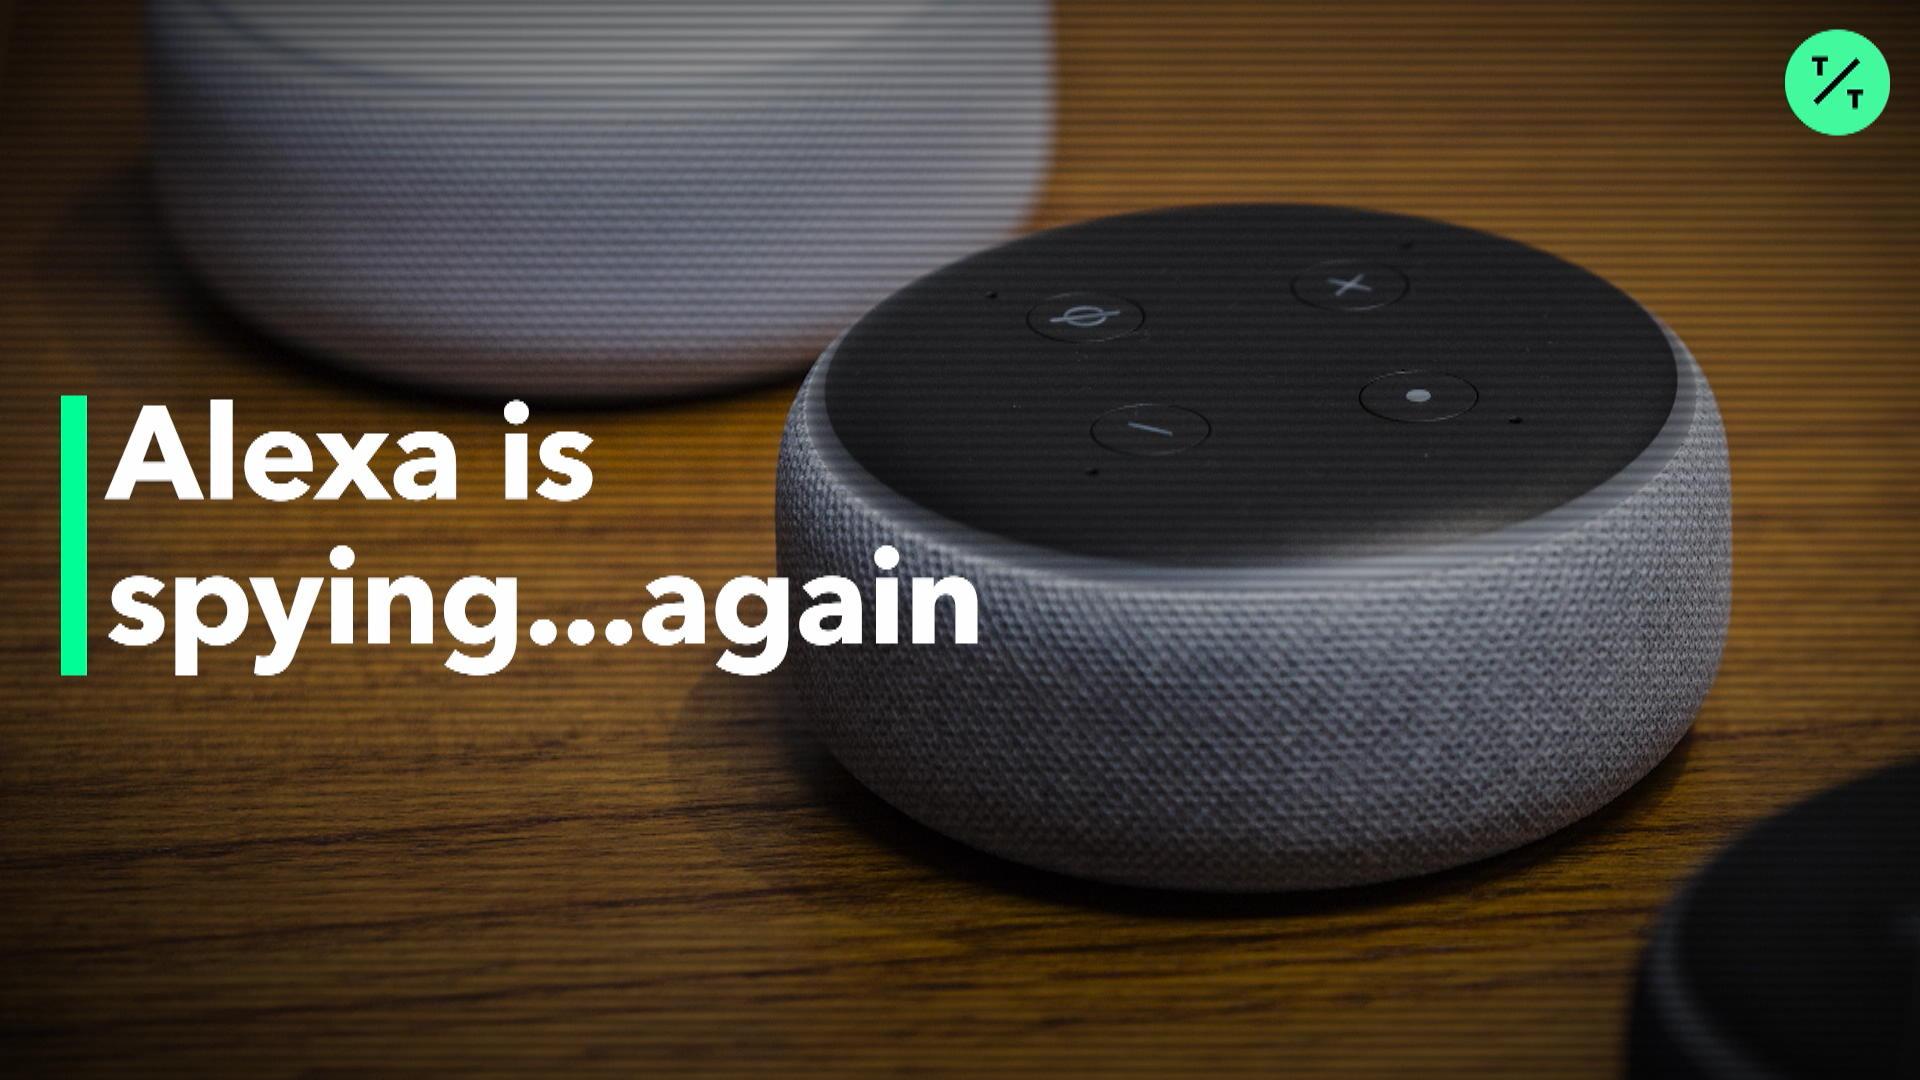 Alexa is Spying...Again